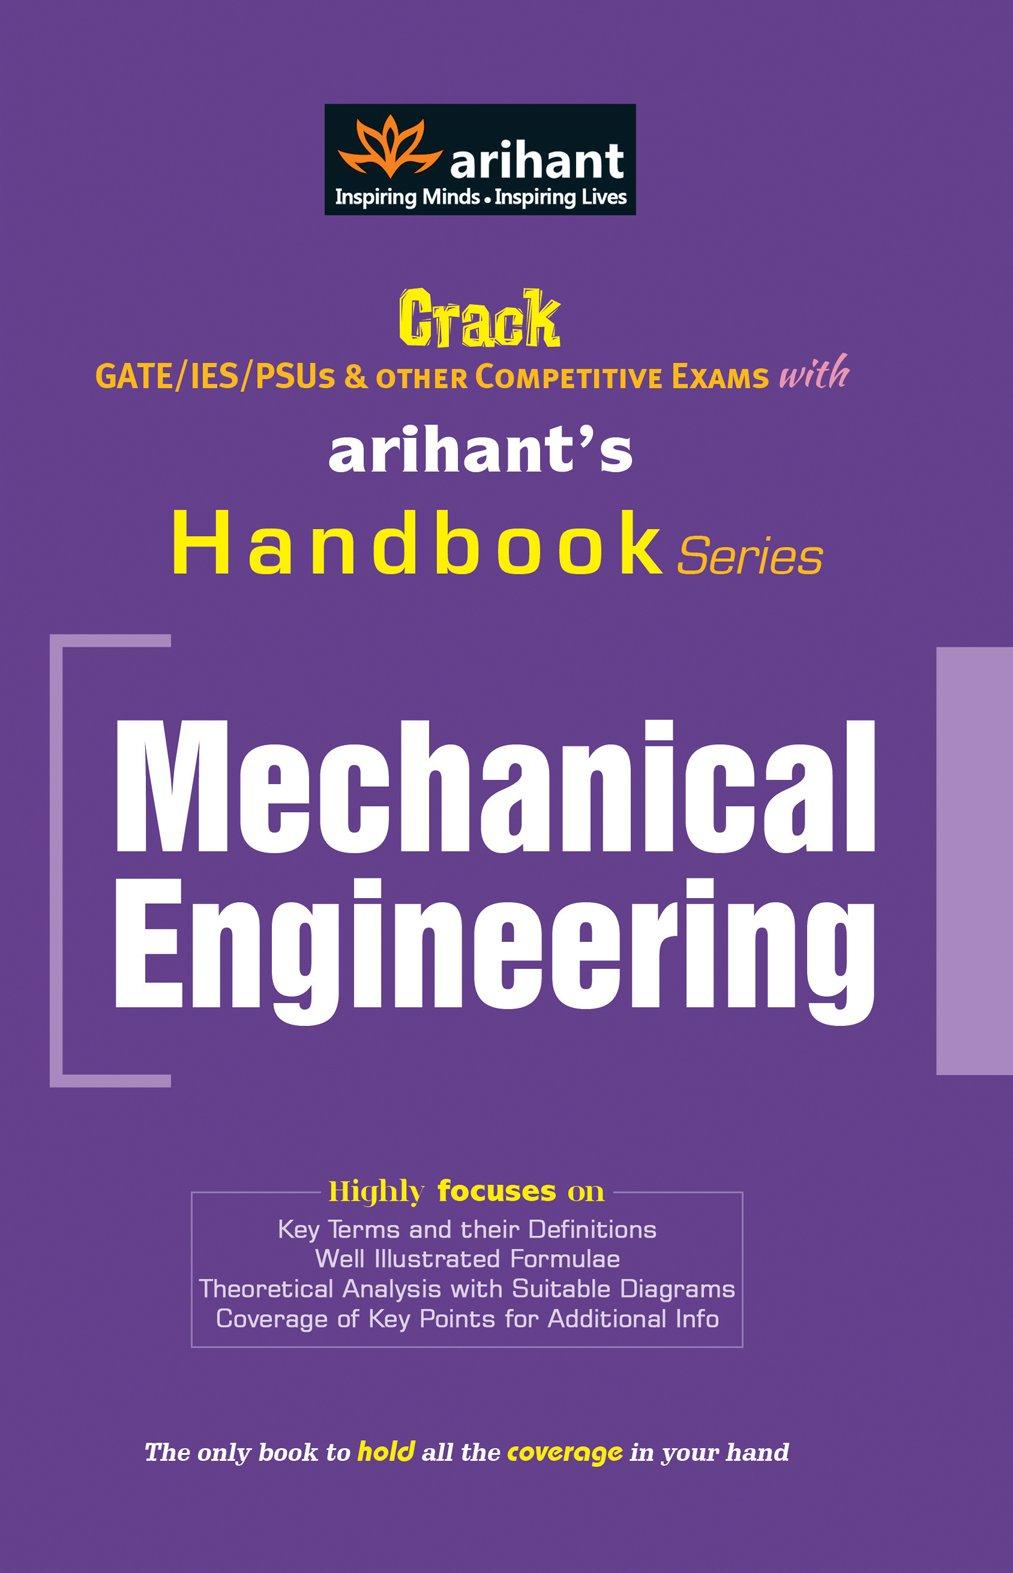 mechanical engineering arihant free